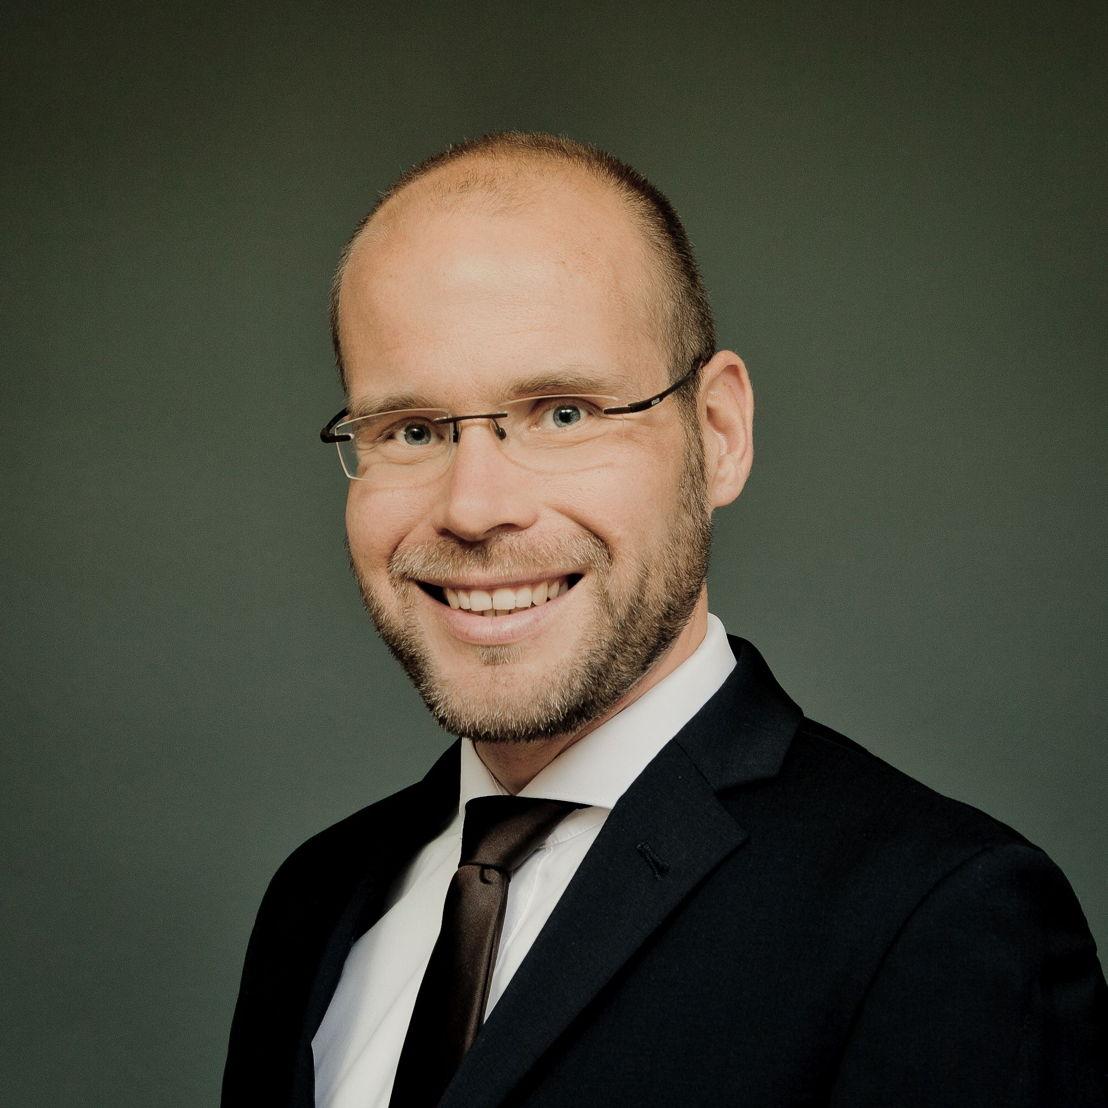 Sven Huschke, CEO